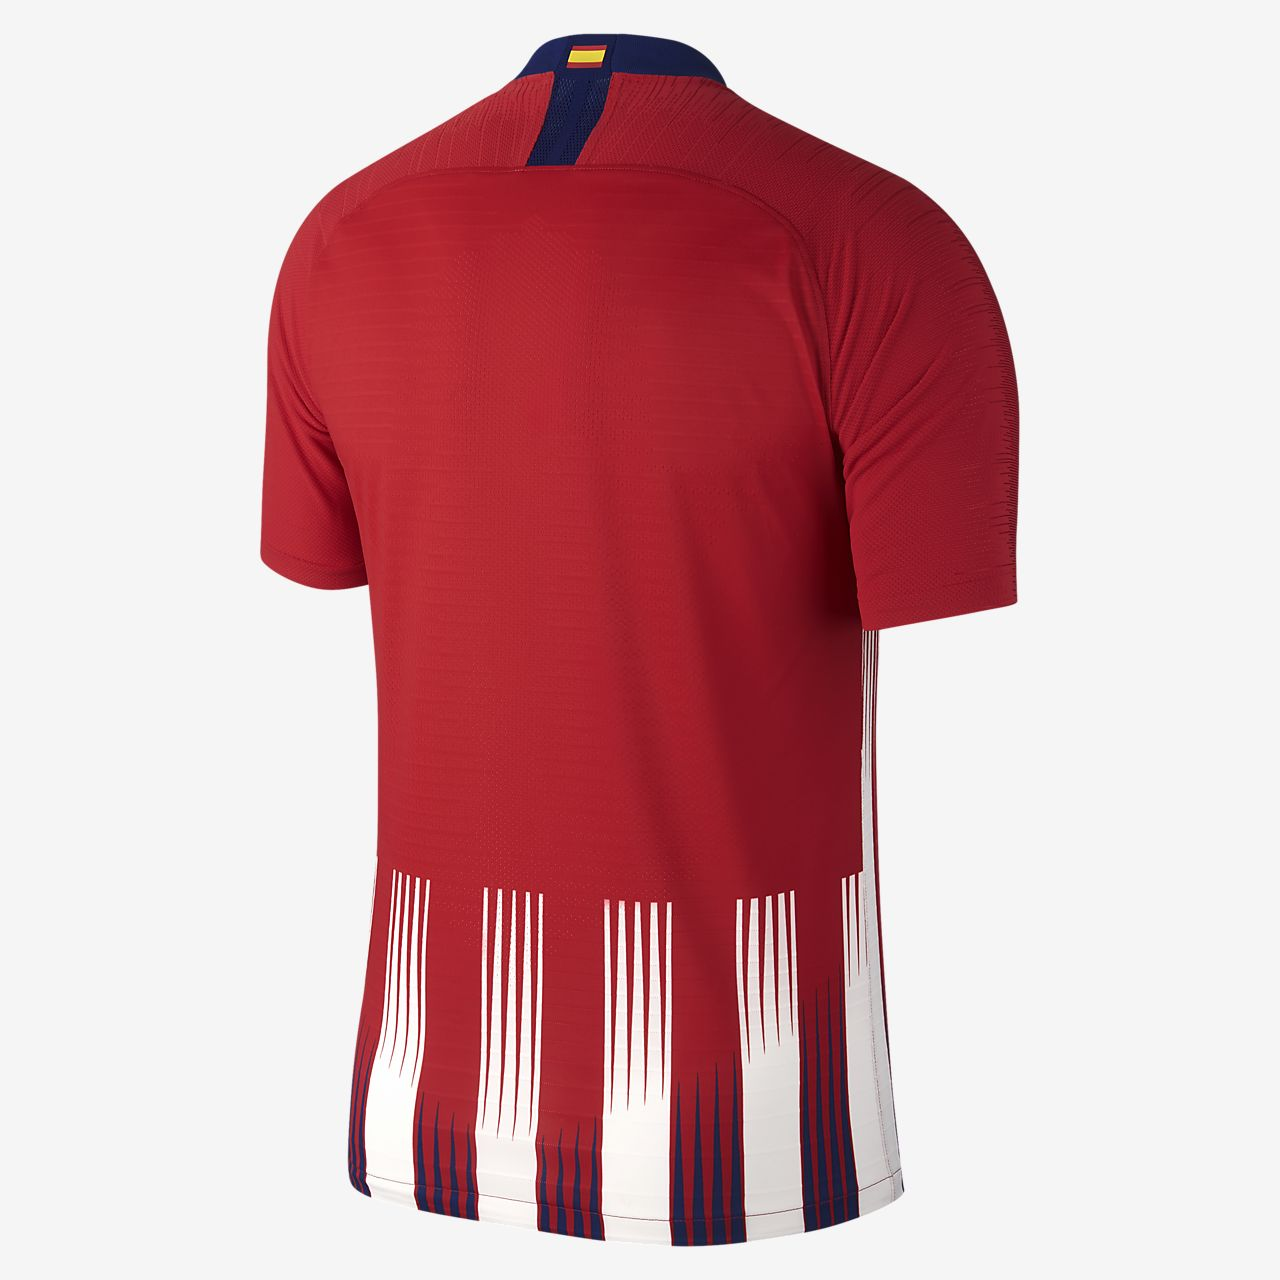 5b8fd056a6c3c ... Camiseta de fútbol para hombre de local Vapor Match del Atlético de Madrid  2018 19